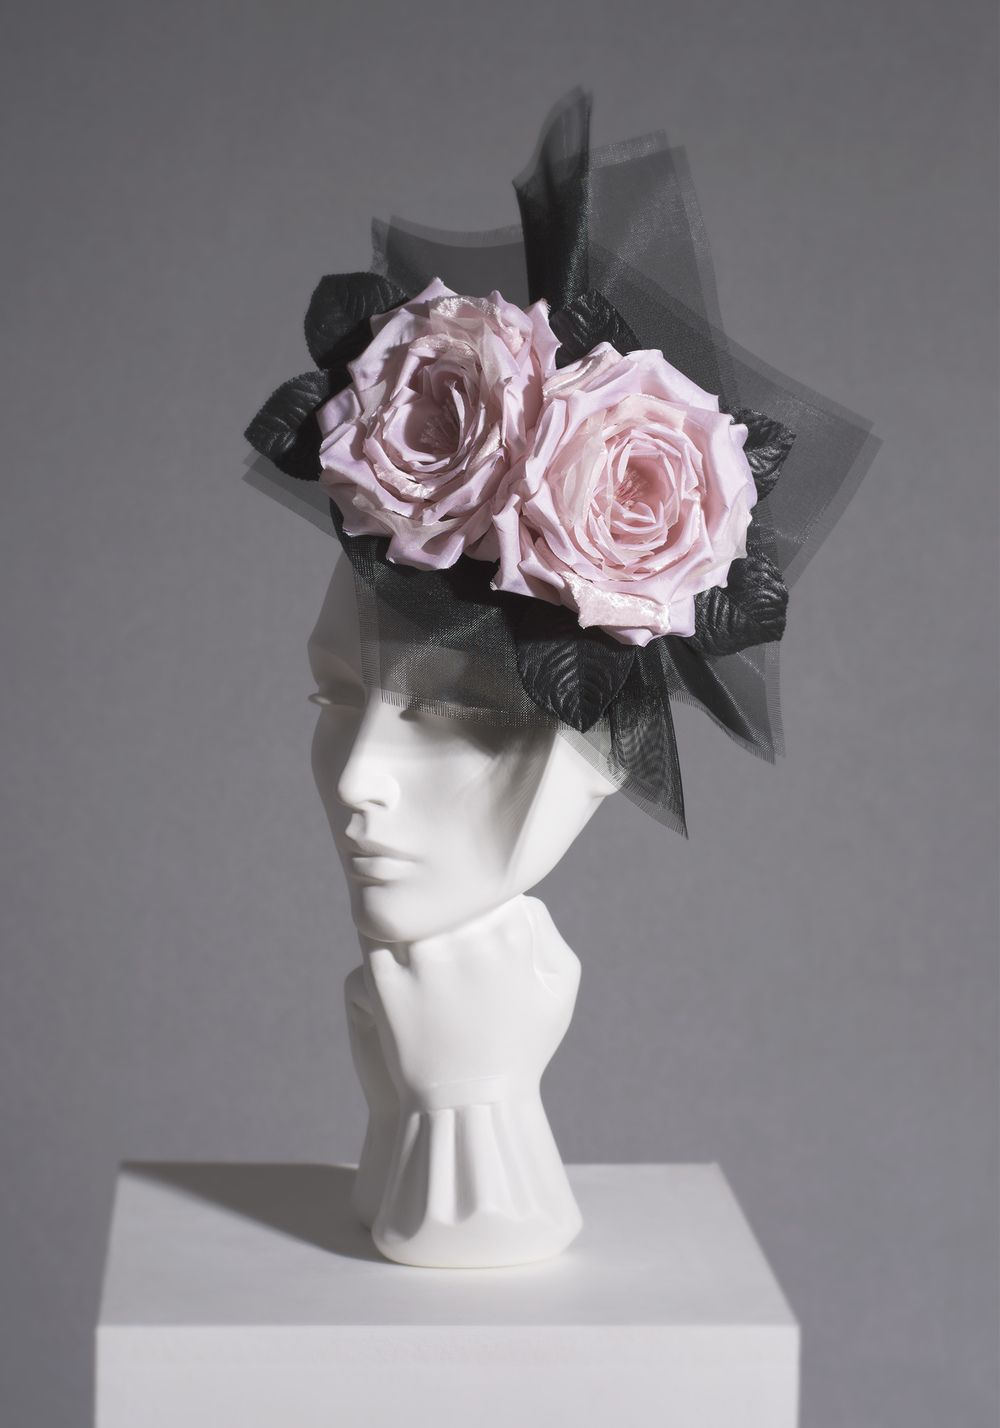 SS16/03 ROSE POSY Veiled hats, Wedding hats, Fancy hats